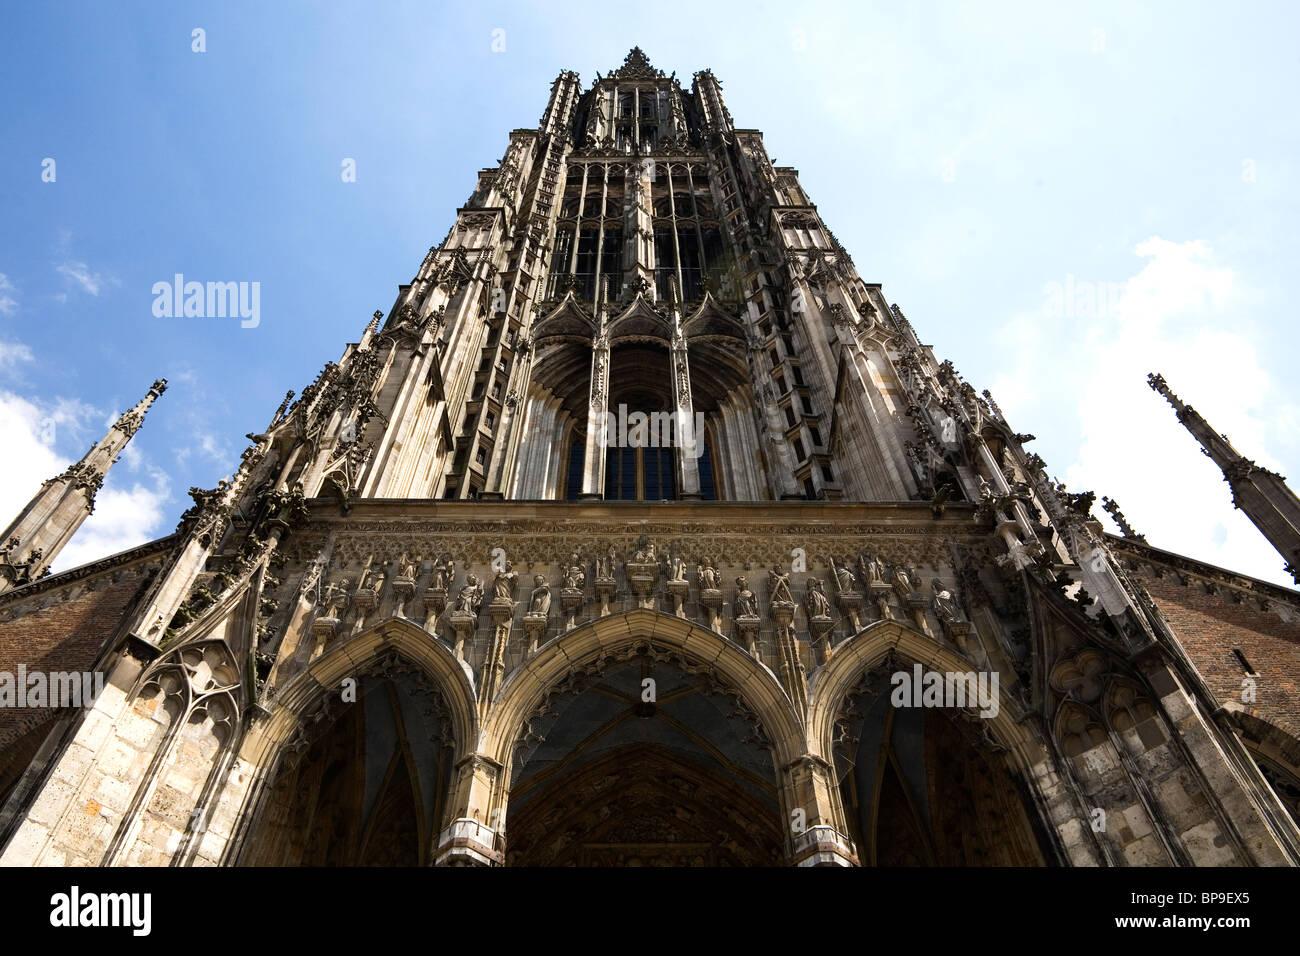 The steeple of Ulm Minster (Ulmer Muenster) in Ulm, Germany. Stock Photo